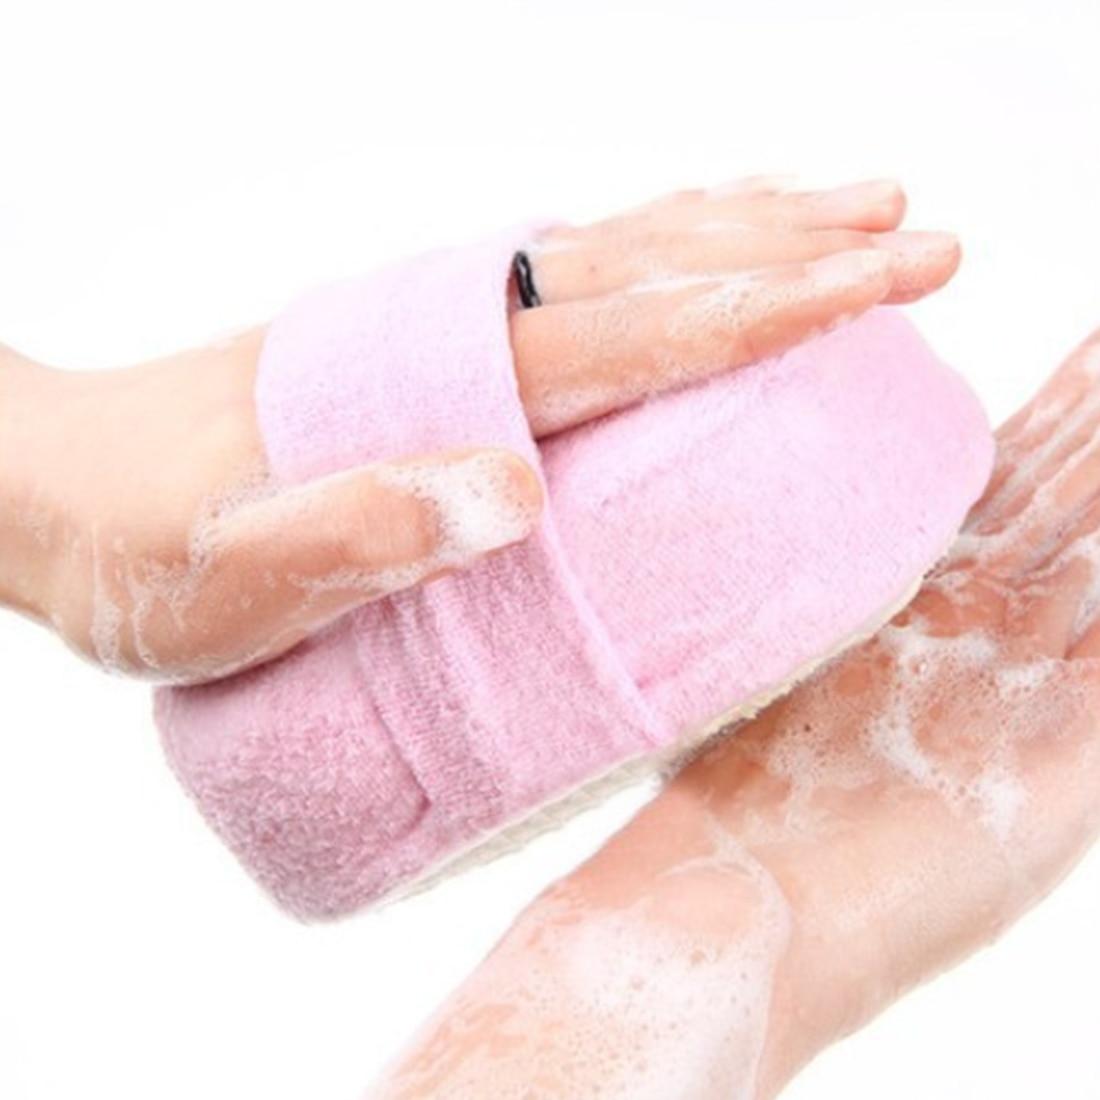 Top Massager Shower Back Spa Scrubber Bath Ball Bath Tubs Cool Ball Bath Towel Scrubber Body Cleaning Mesh Shower Wash Sponge